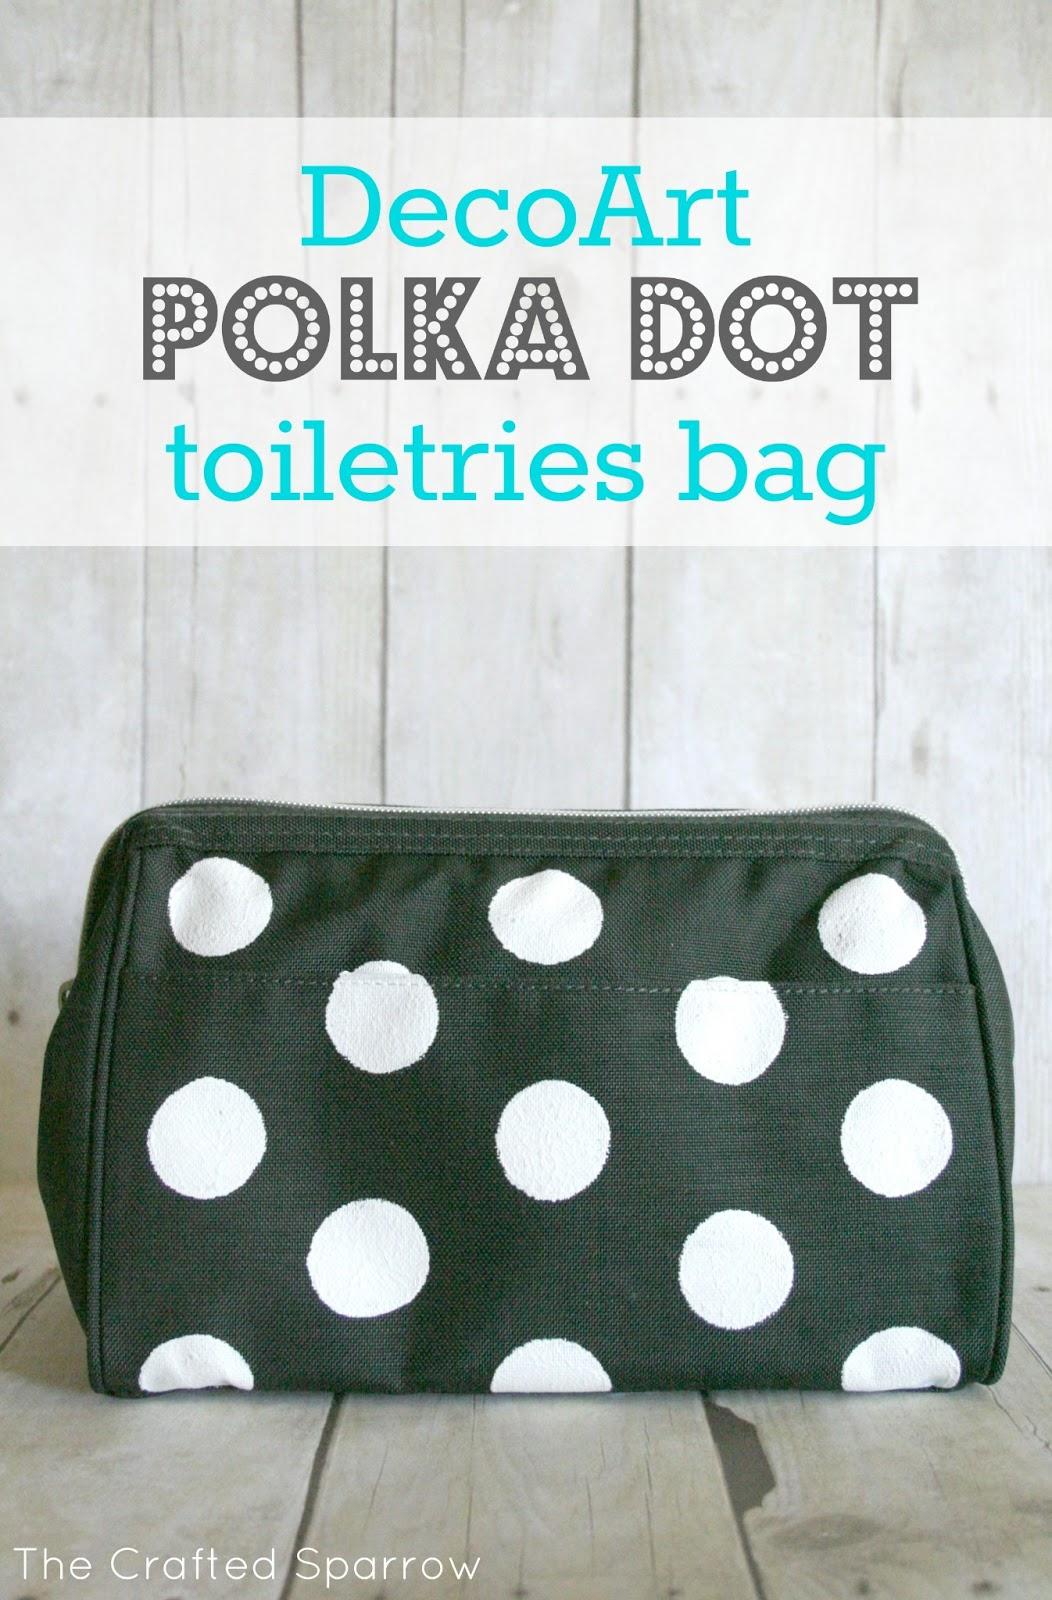 78e532ba4758 DecoArt Polka Dot Toiletries Bag - The Crafted Sparrow